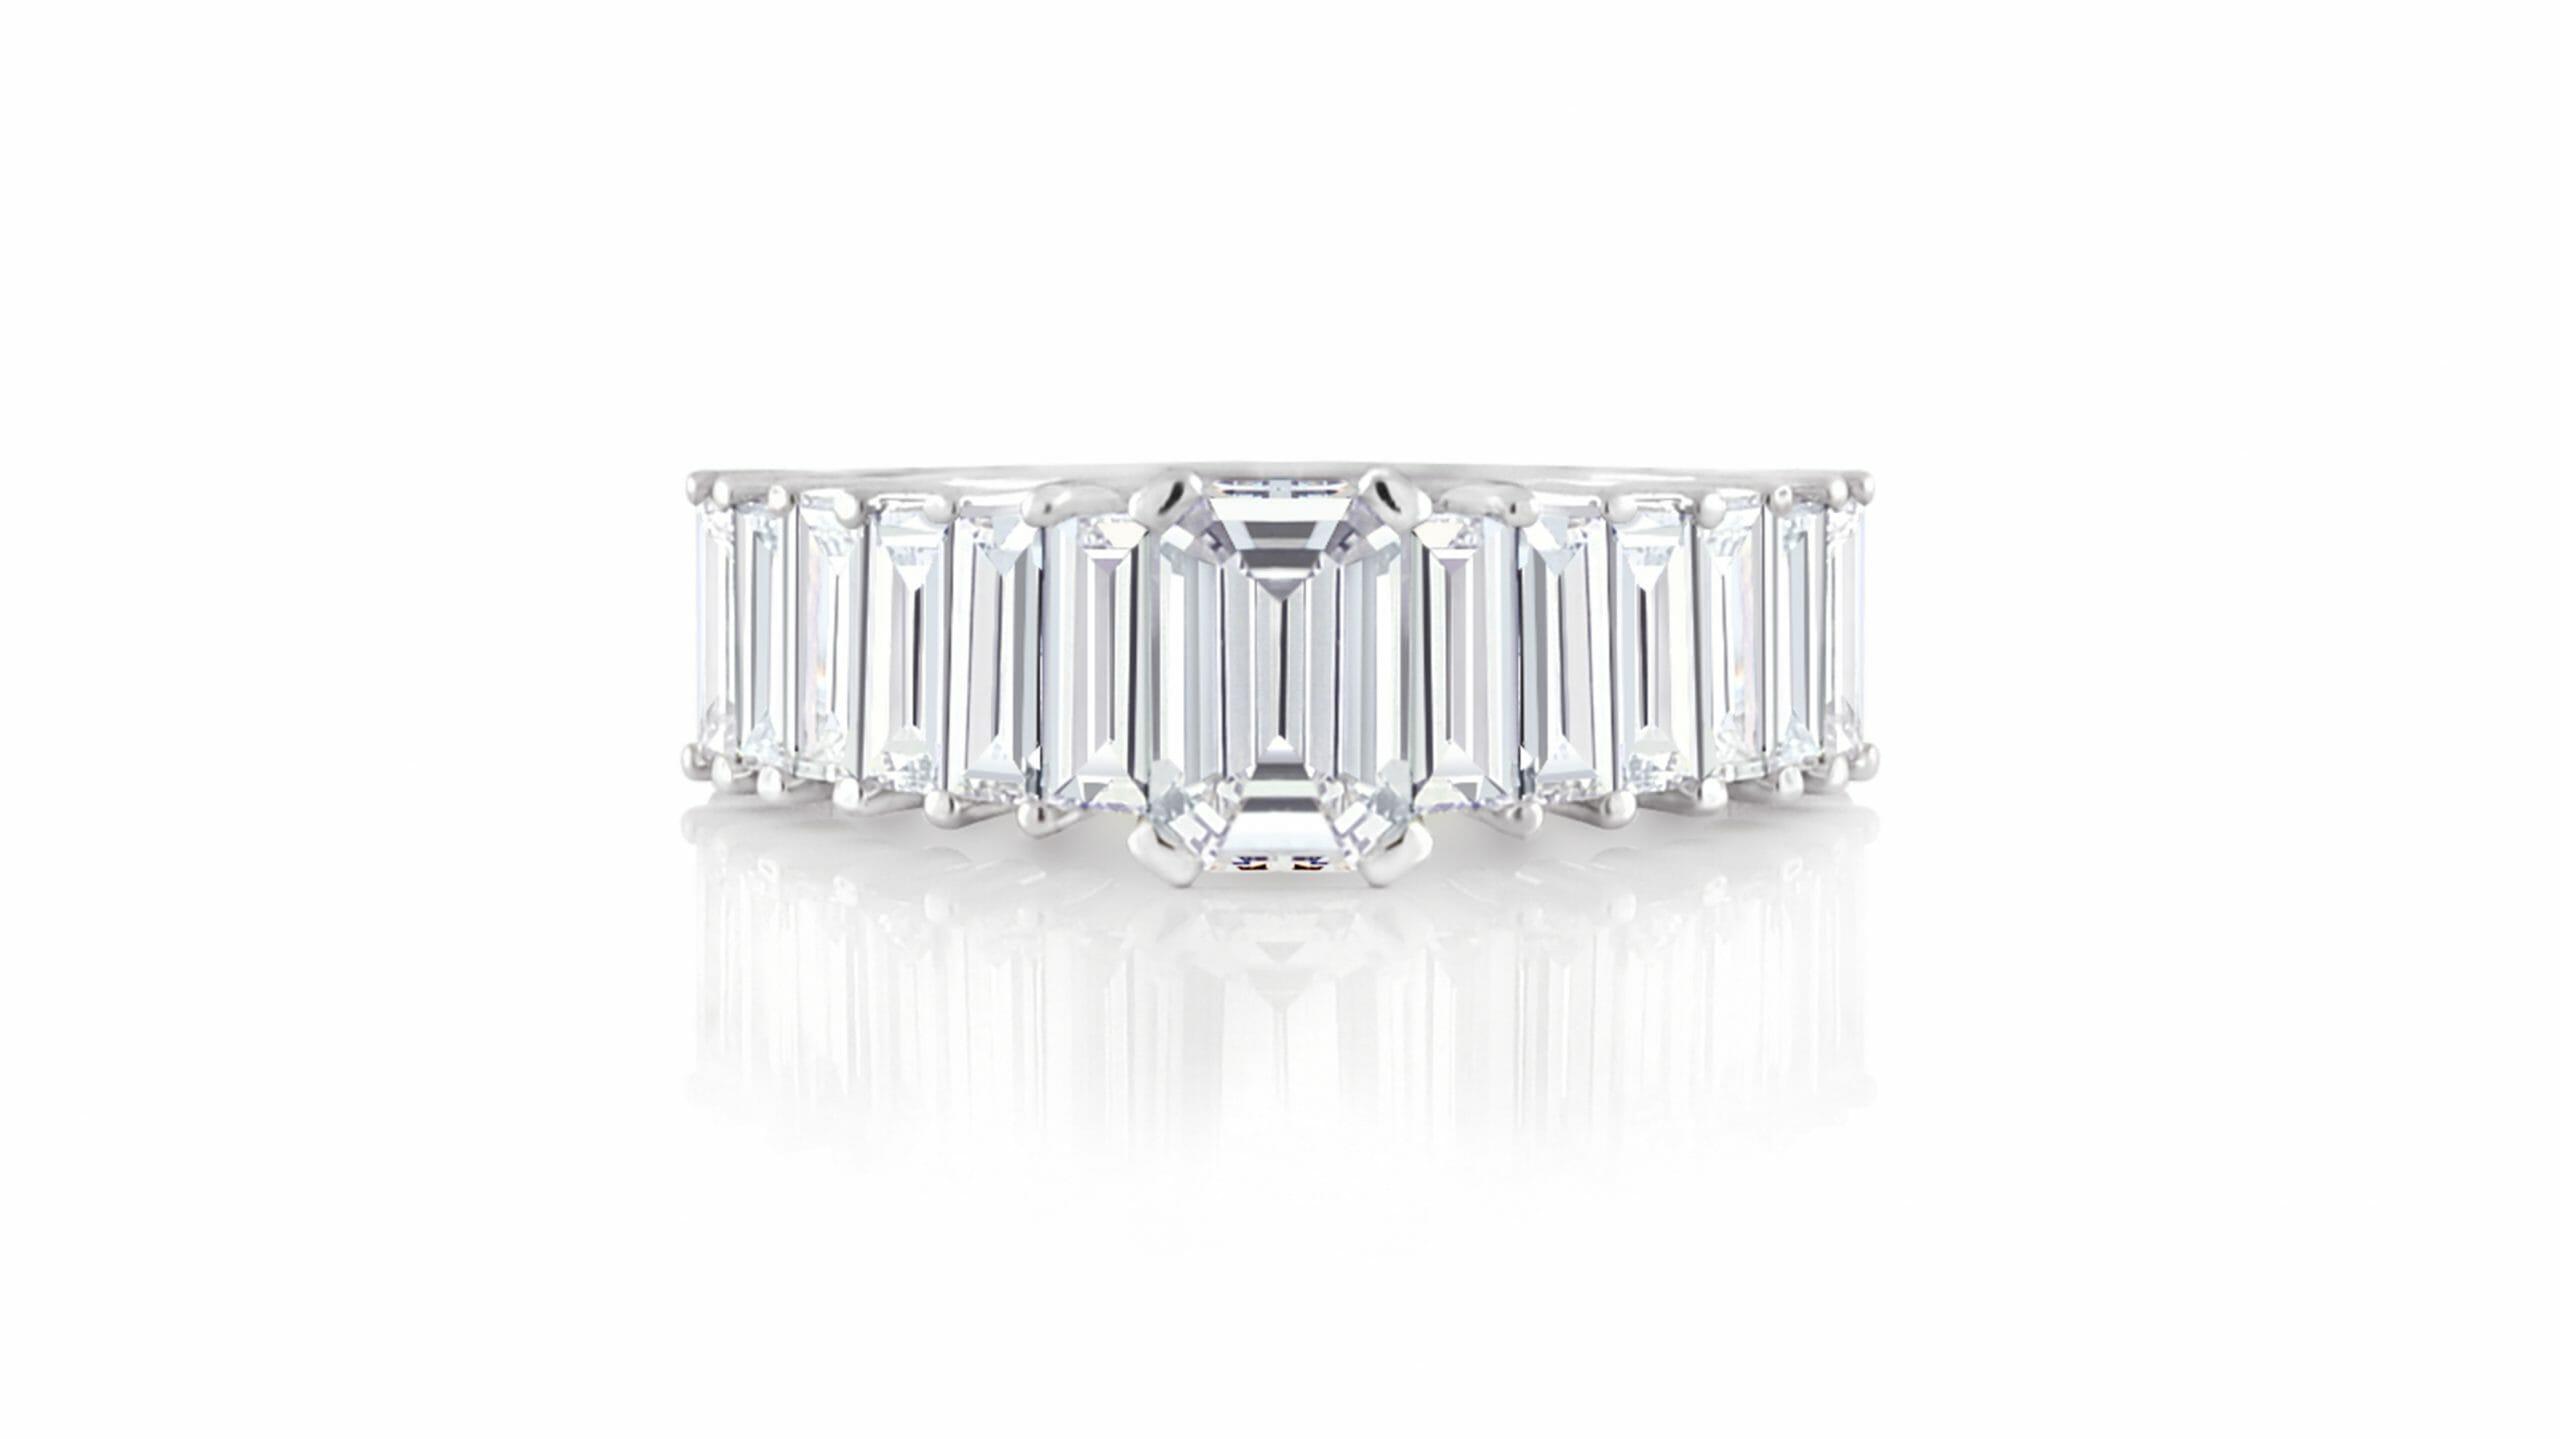 Emerald & Baguette Dress Ring | White gold, emerald and baguette cut diamond dress ring